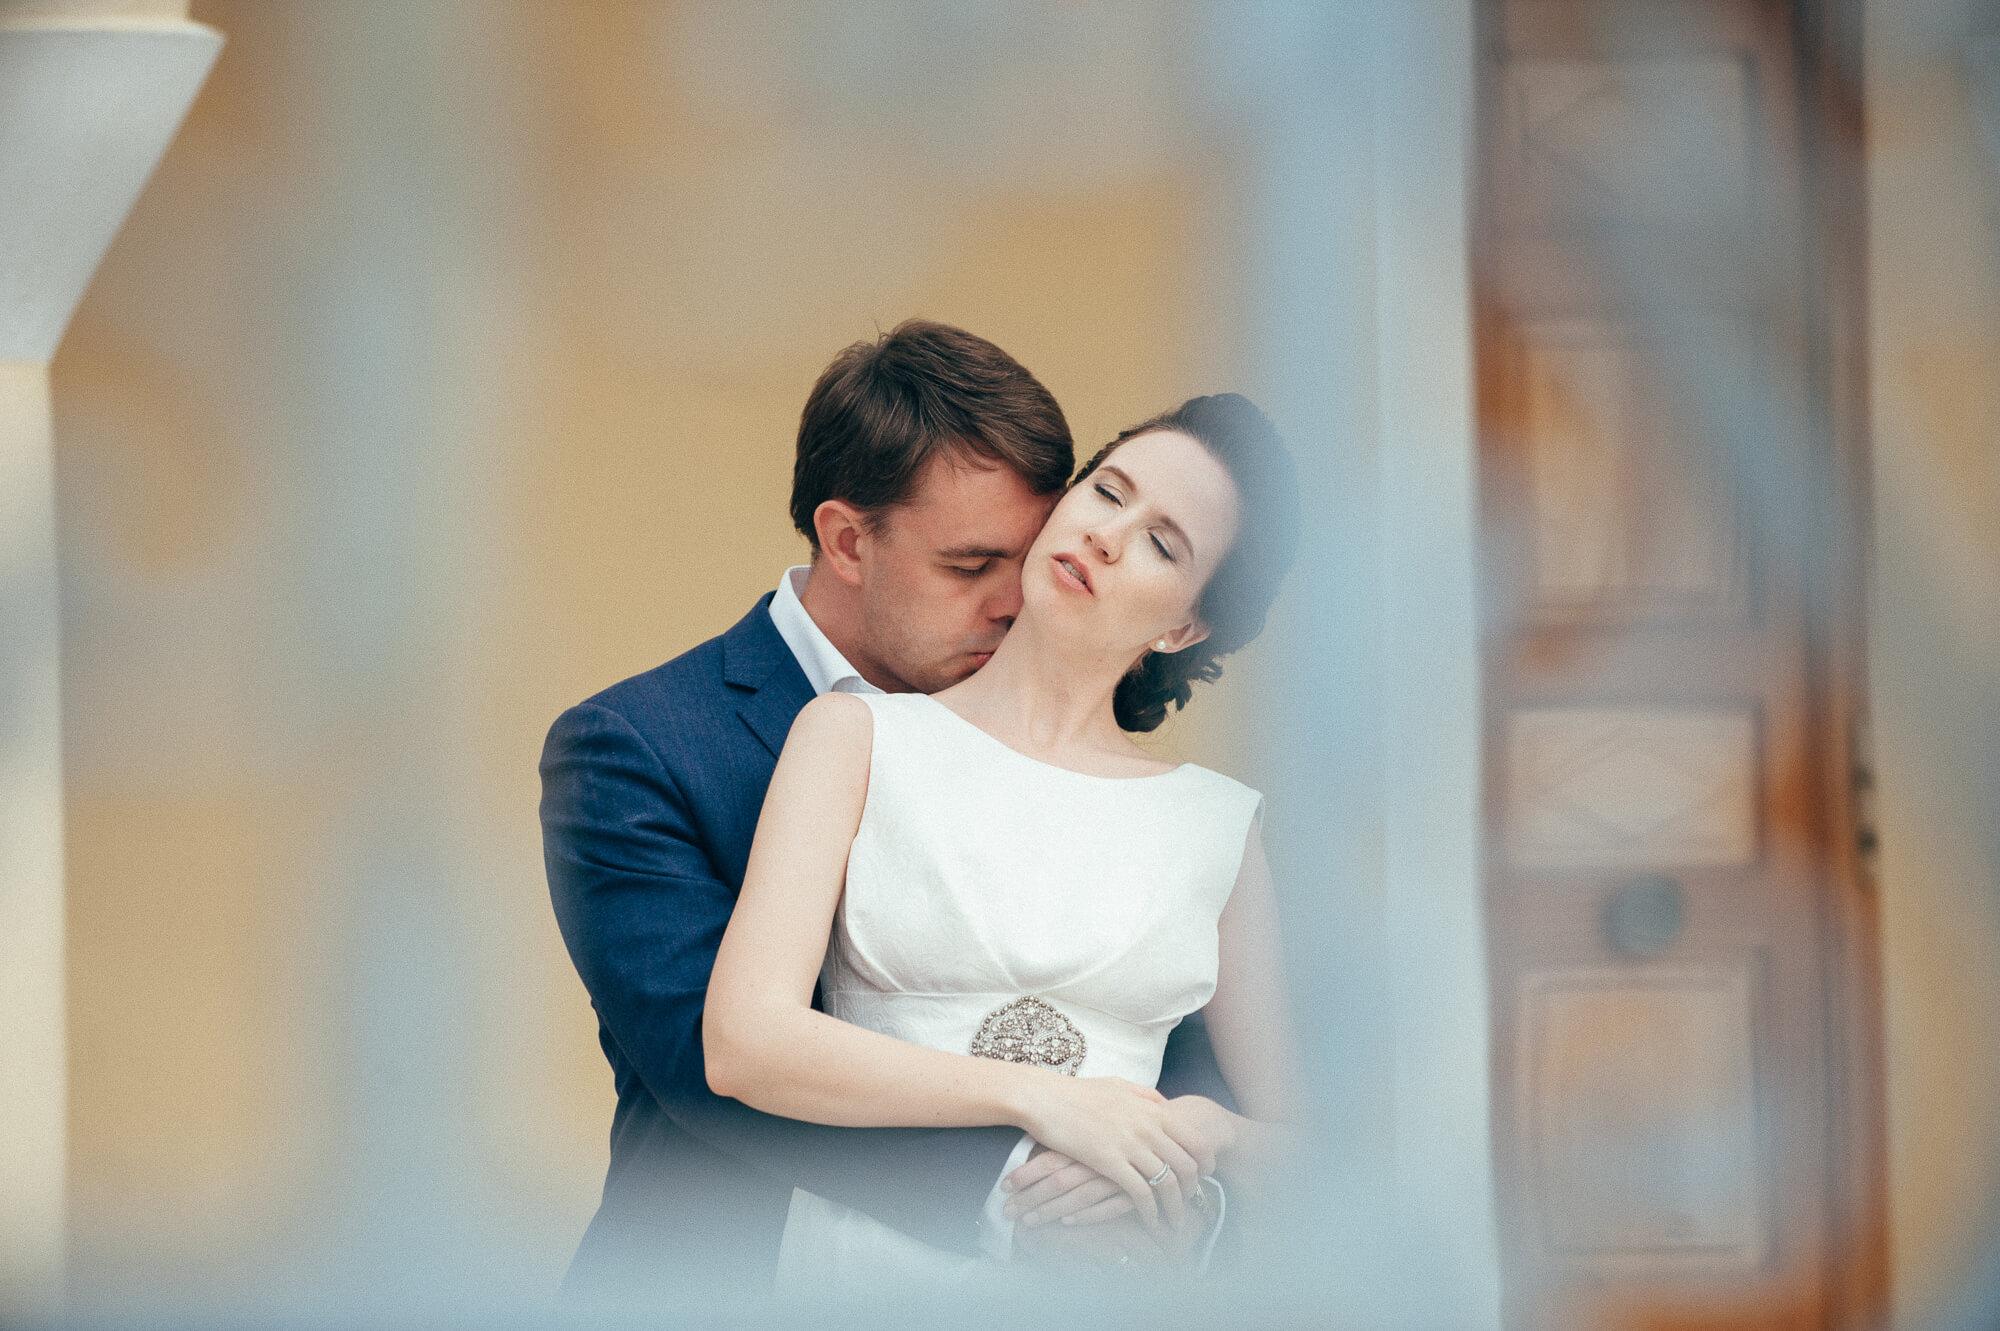 manes-wedding-photographer-greece-148